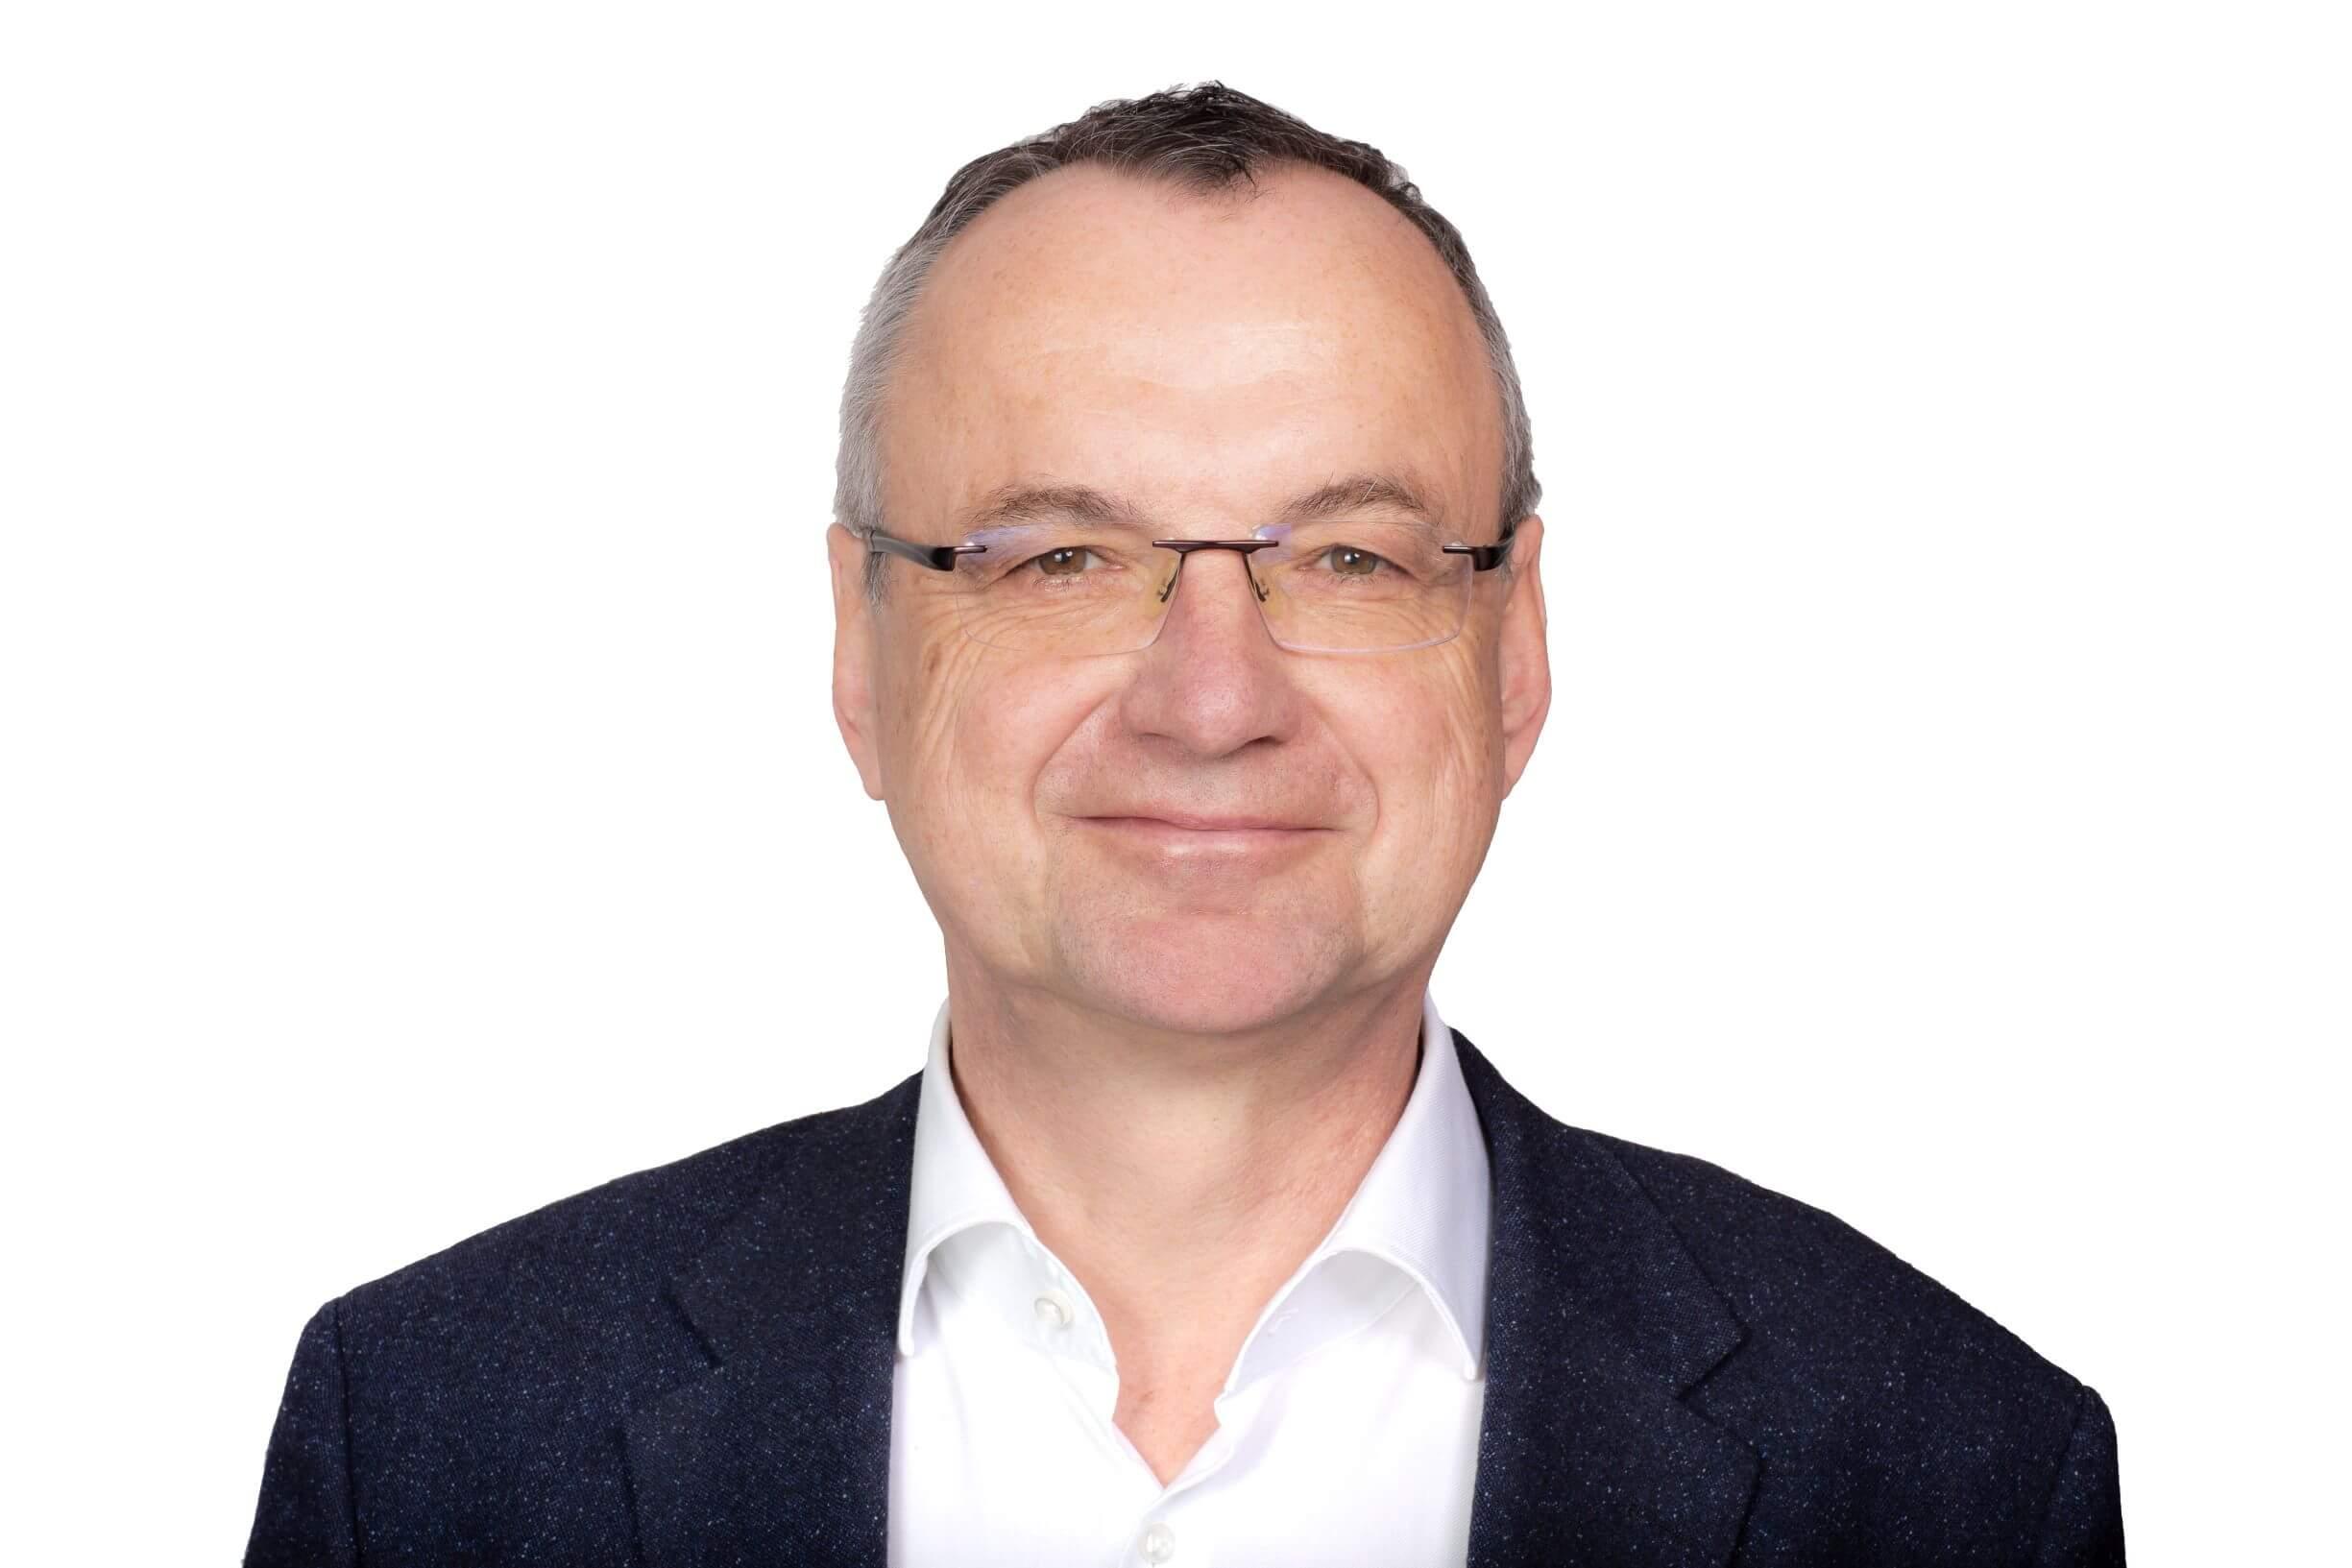 Jürgen Samuel